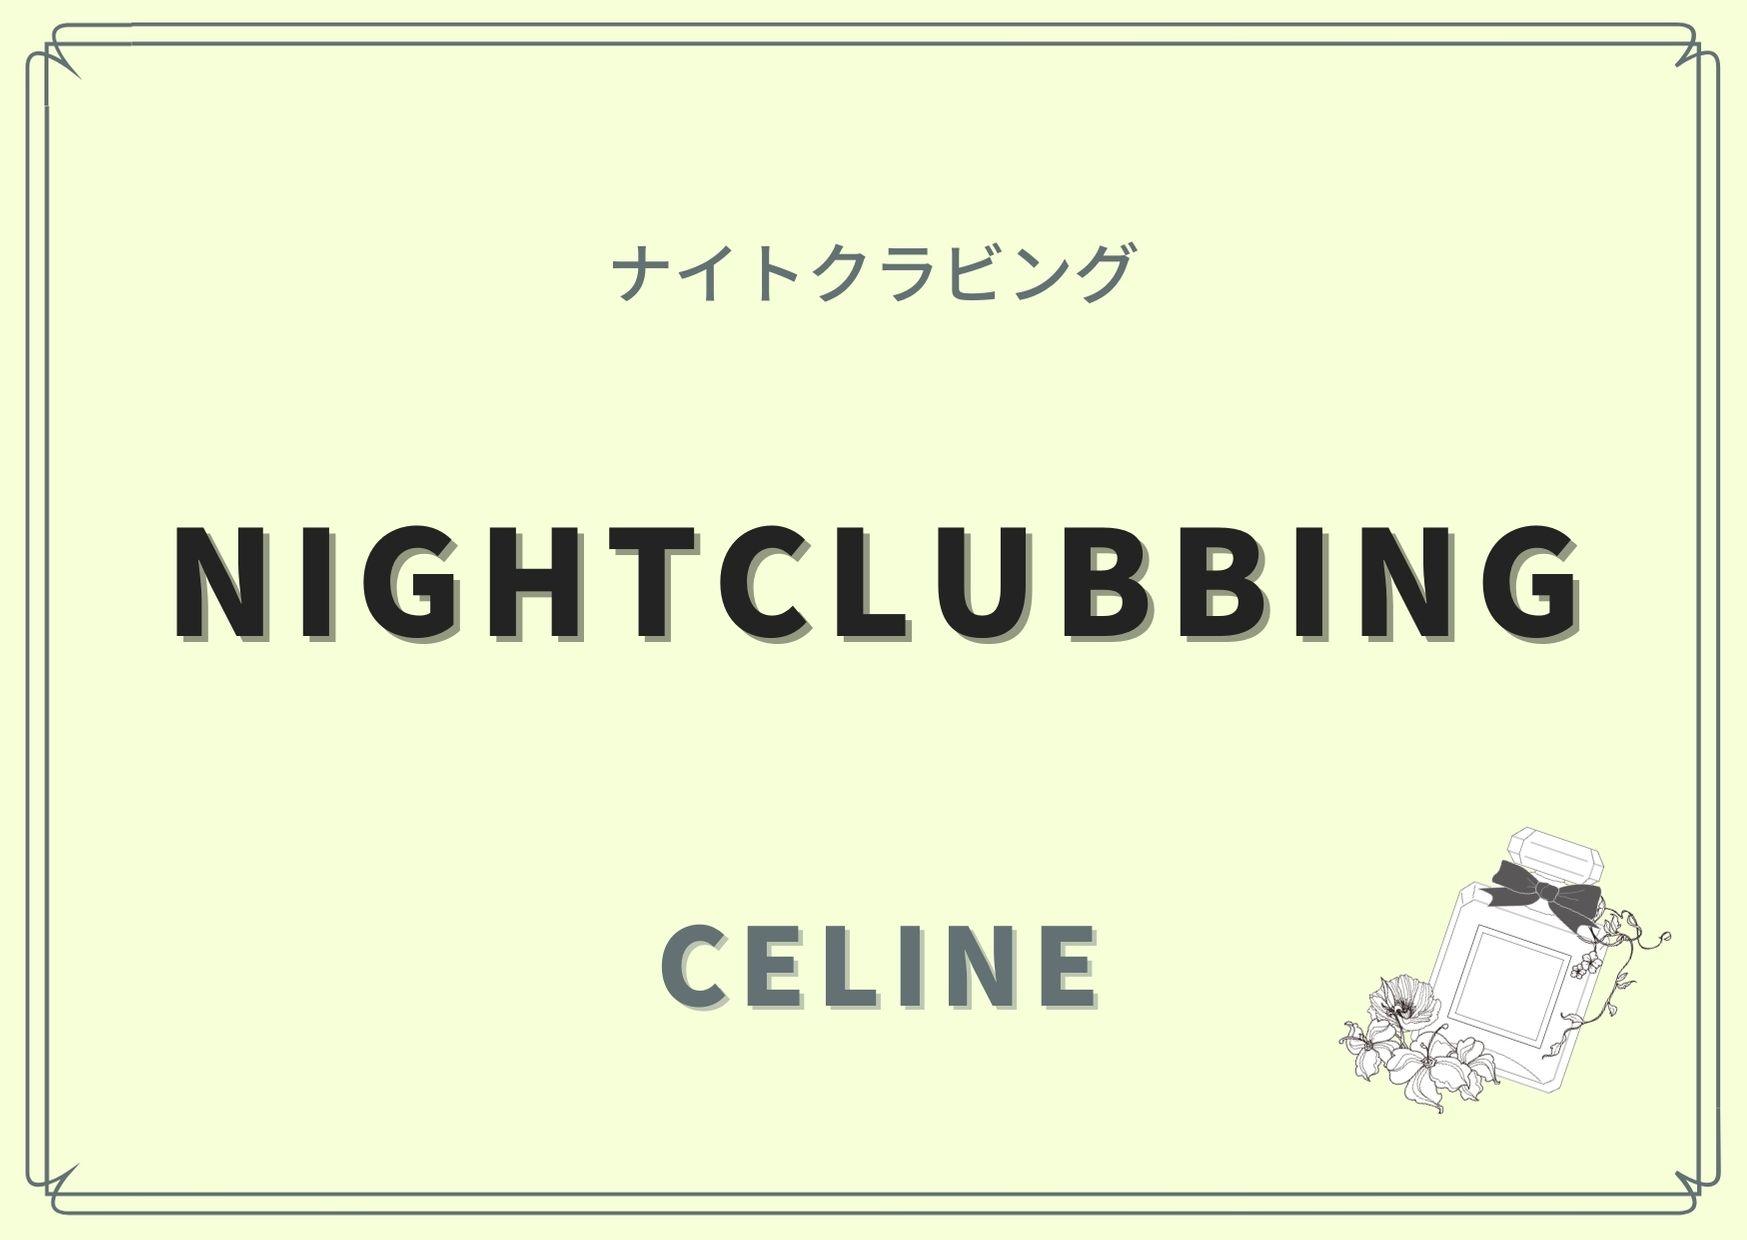 Nightclubbing(ナイトクラビング)/CELINE(セリーヌ)